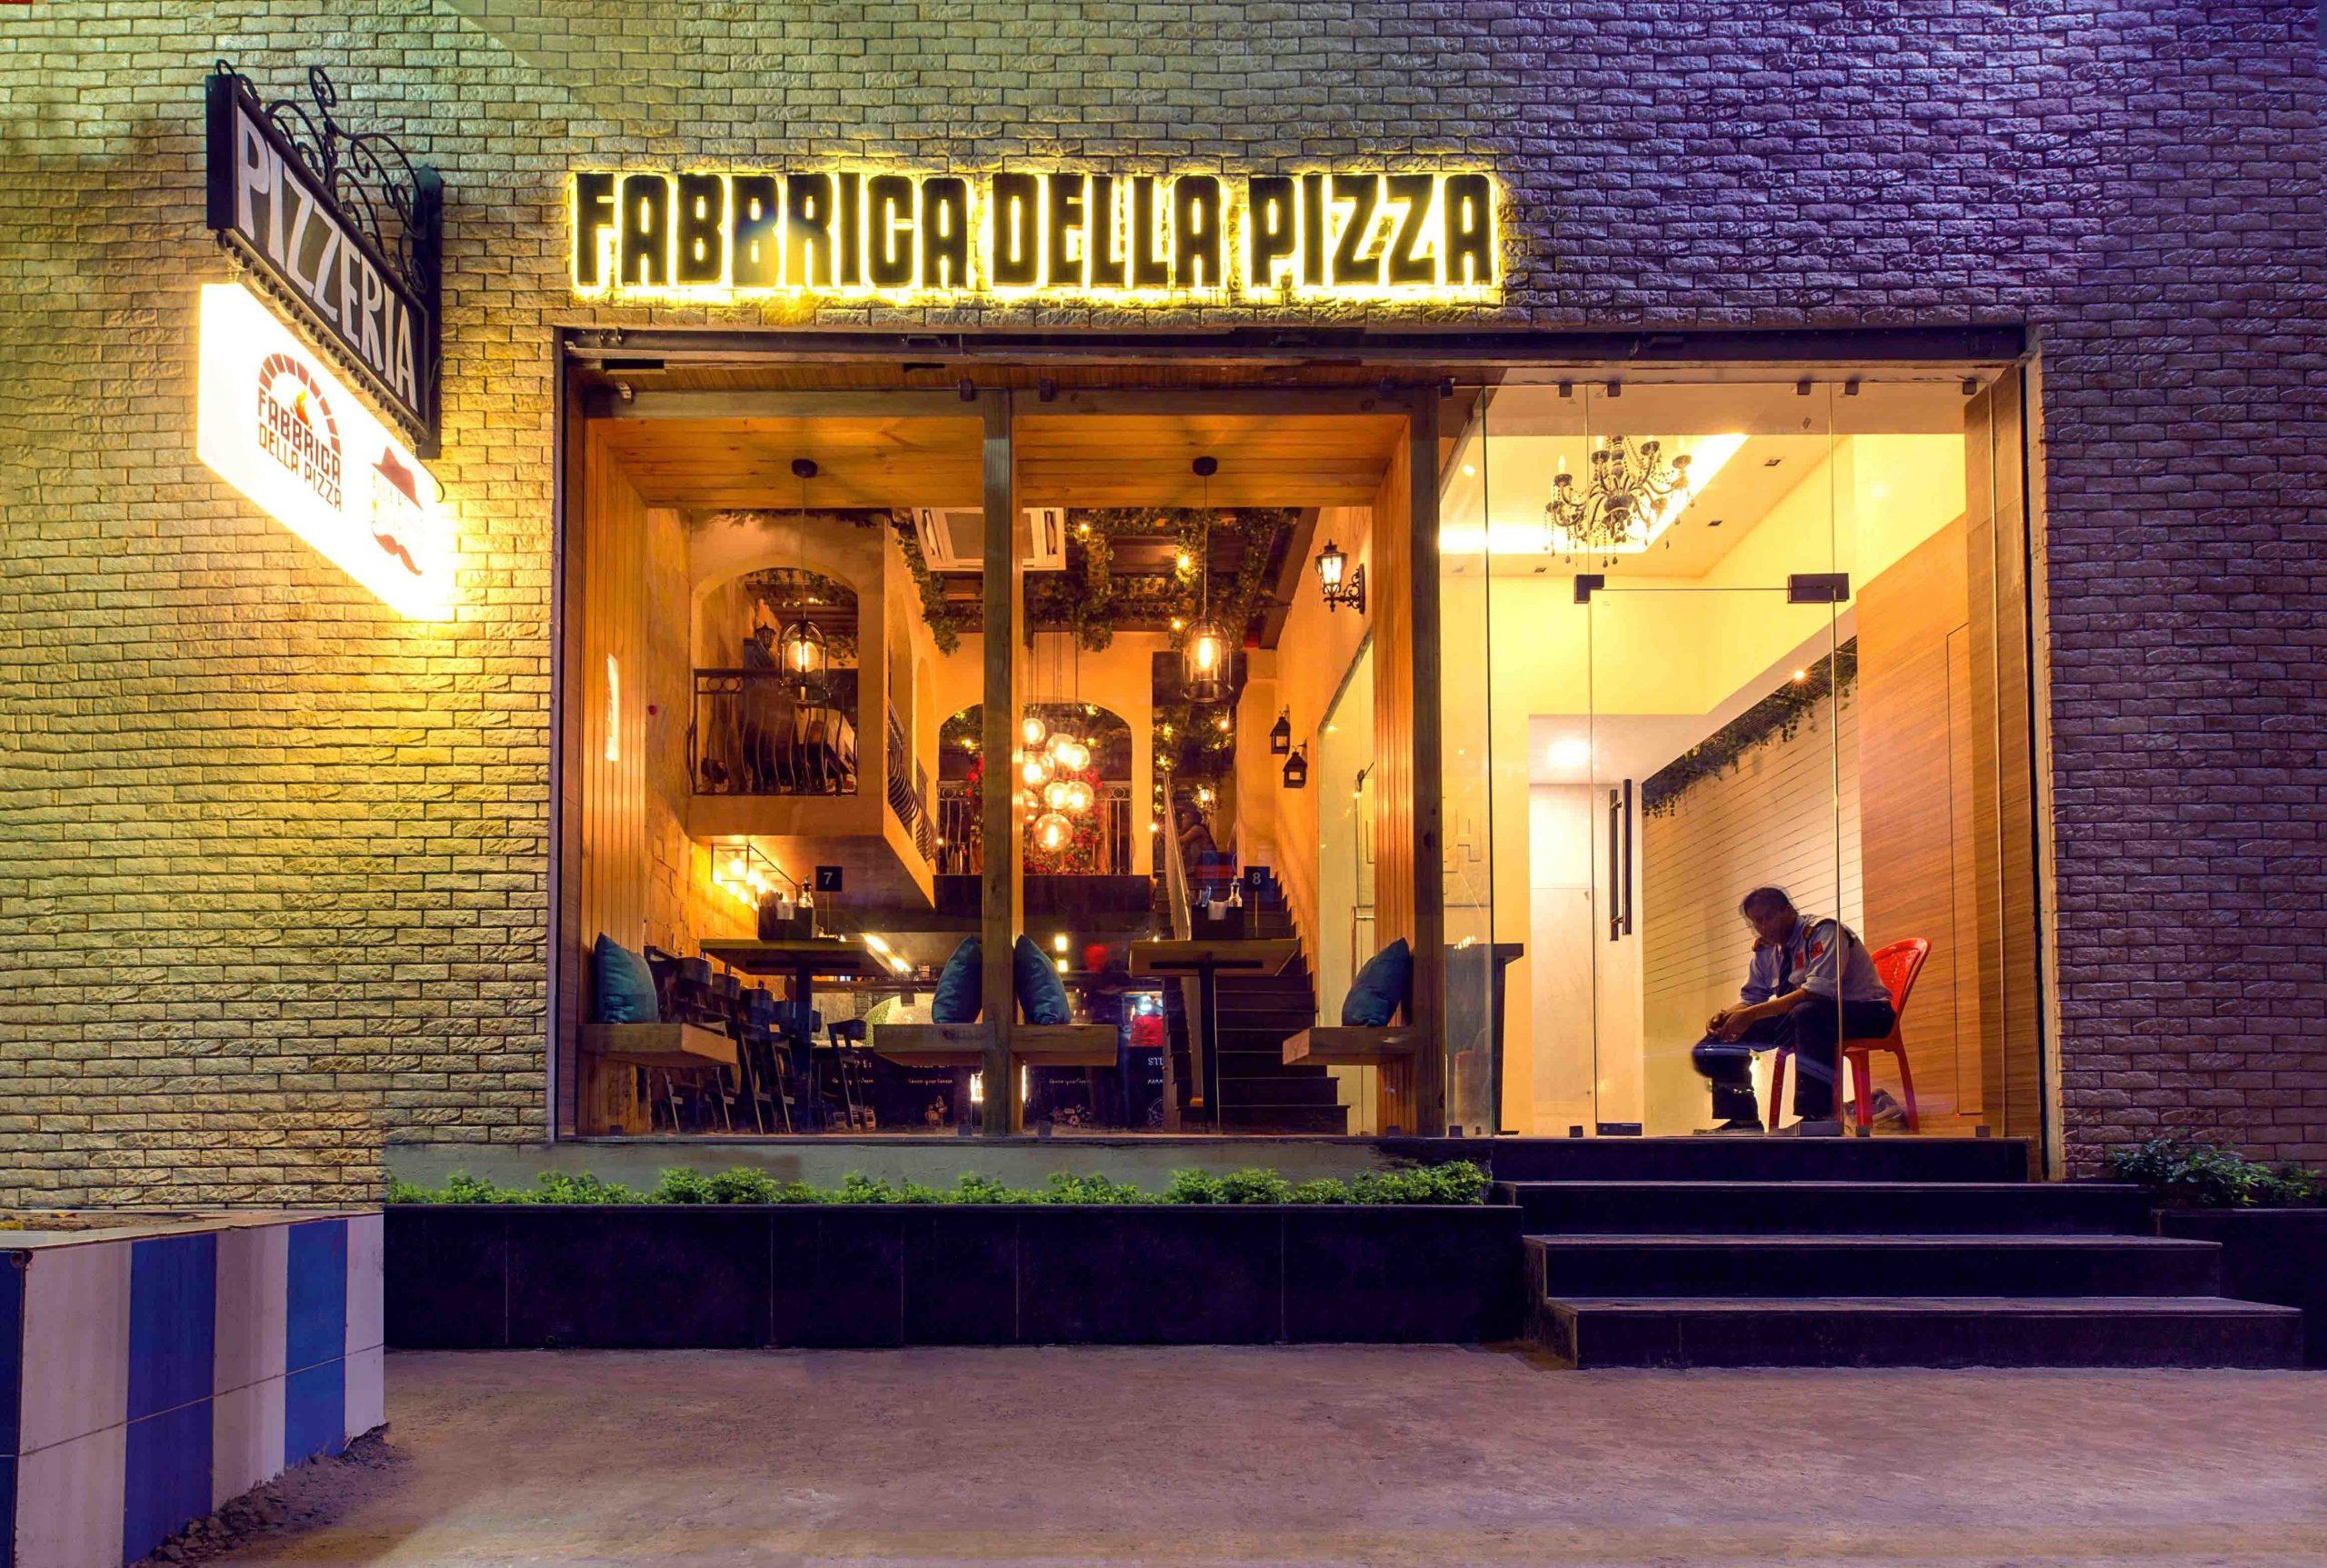 Fabbrica Della Pizza - Restaurants In Kolkata That Every Tourists Must Visit